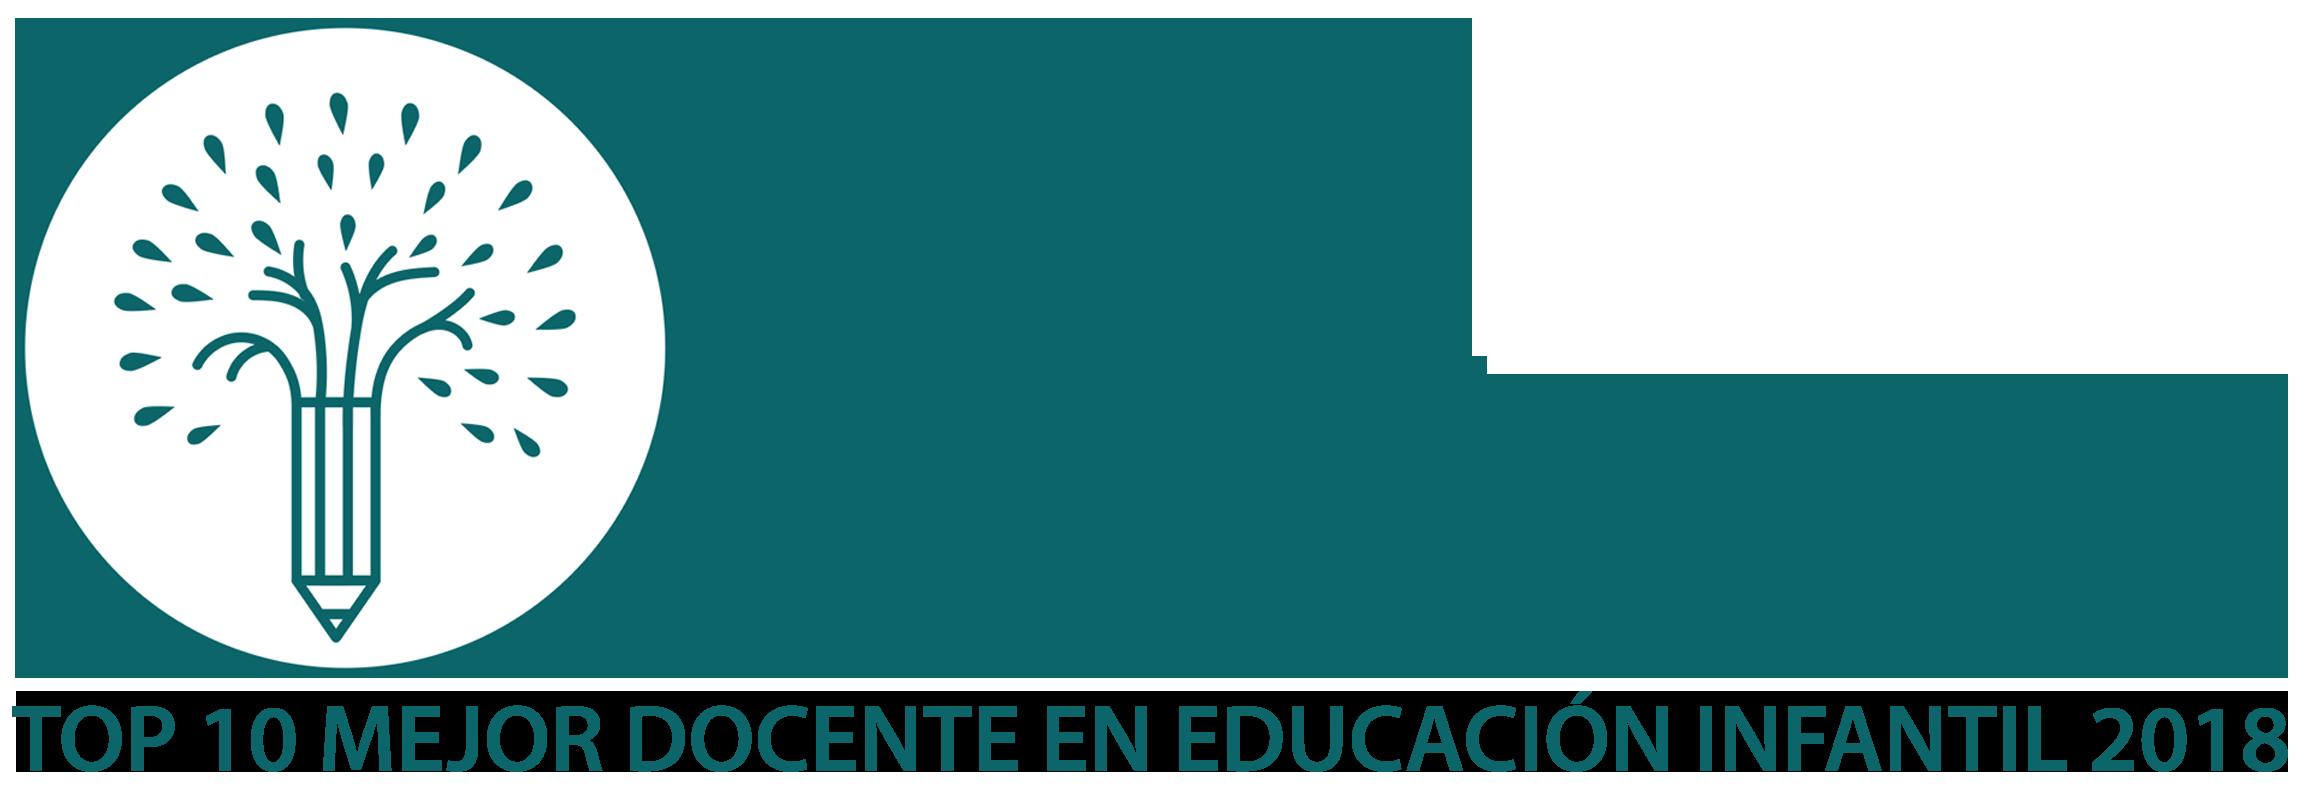 Cori Chamorro